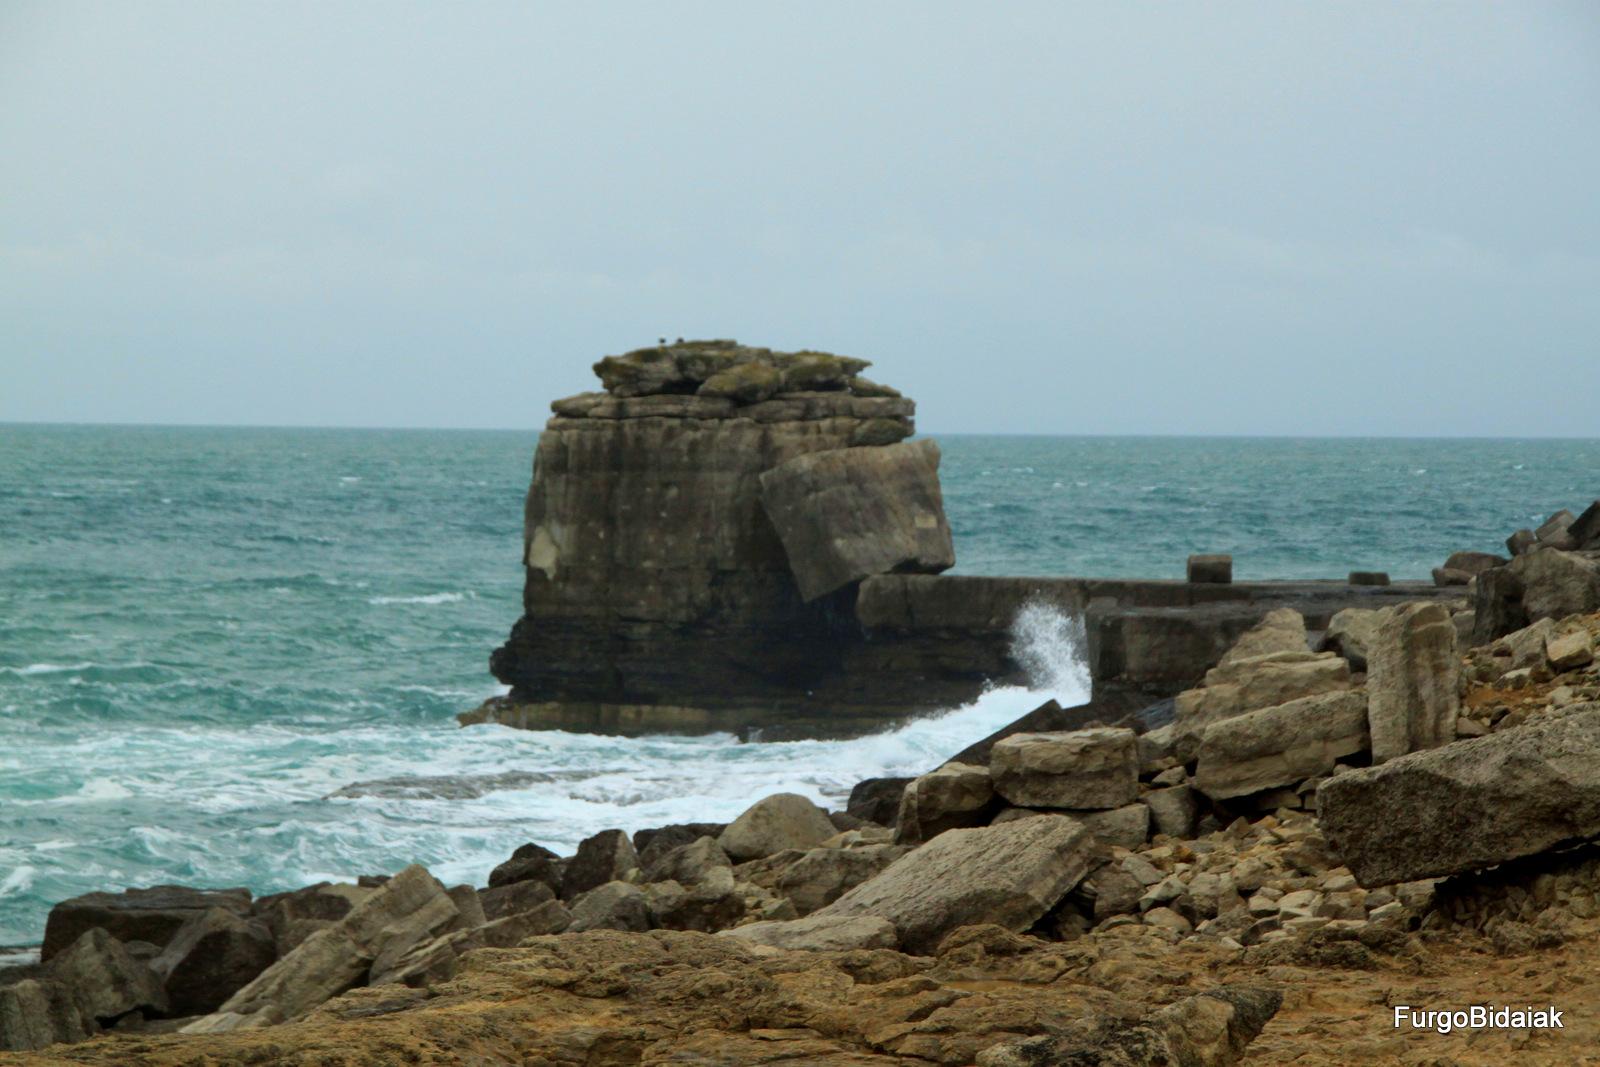 Pulpite Rock